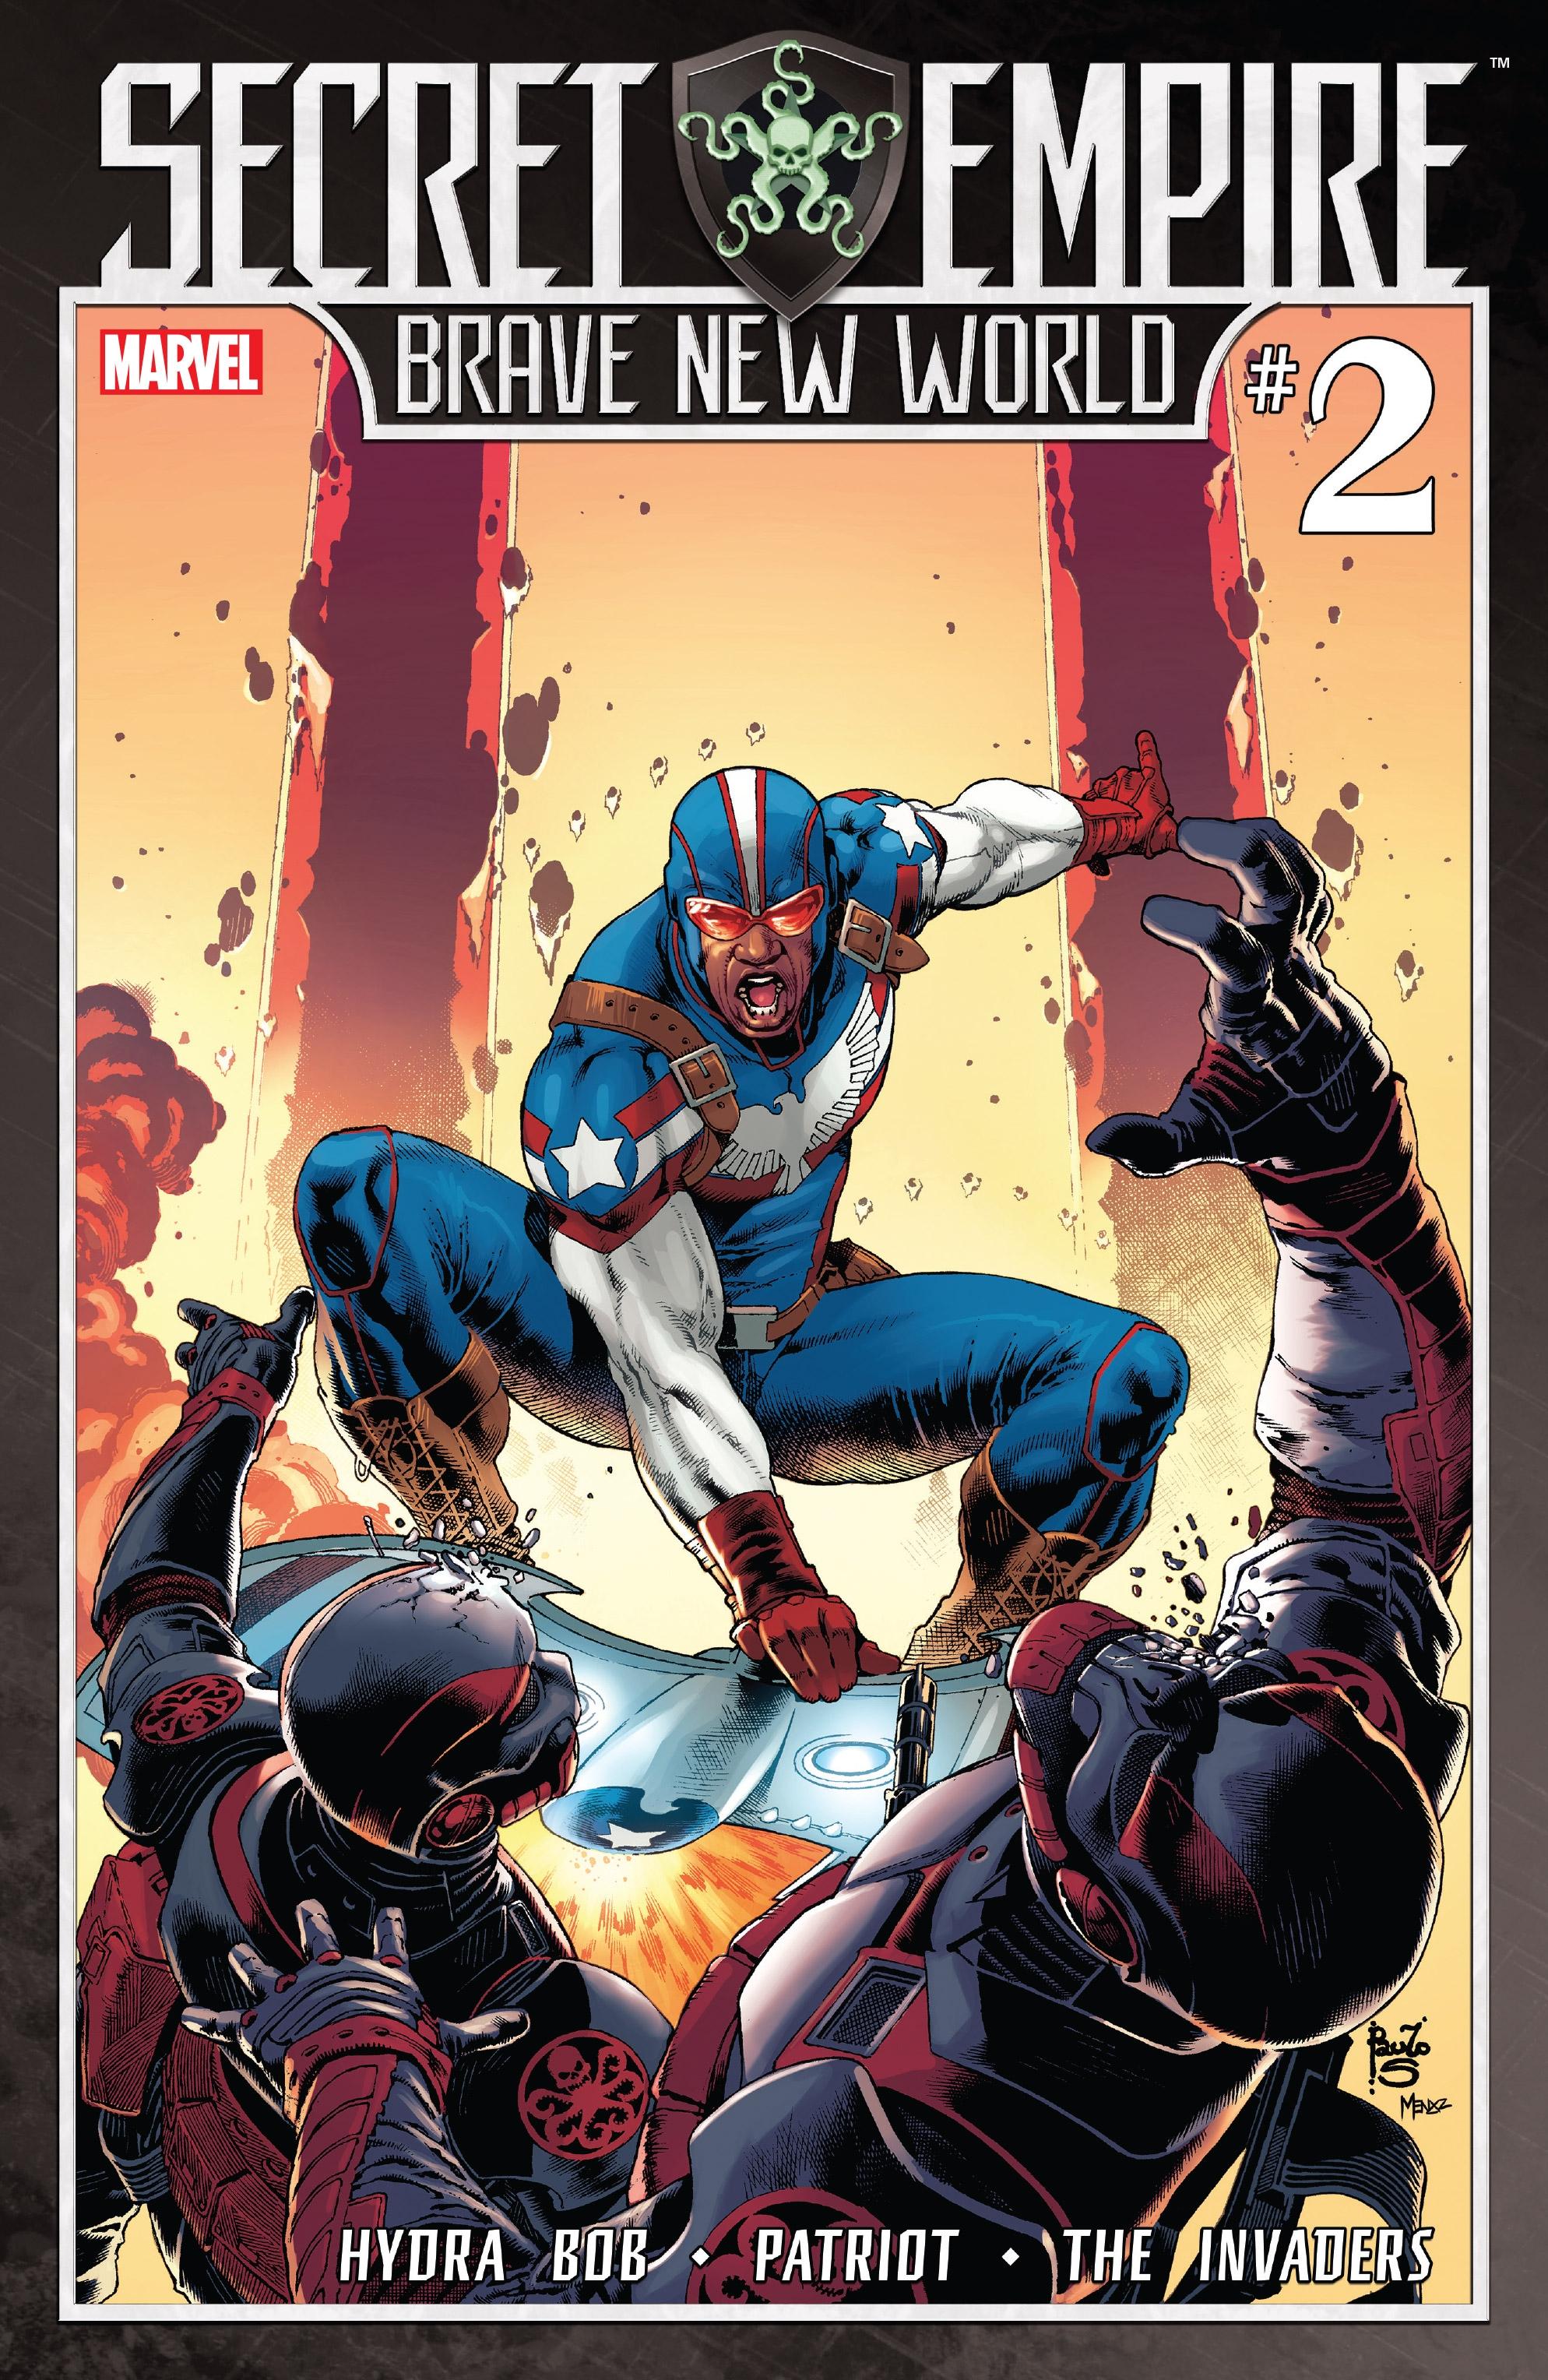 Read online Secret Empire: Brave New World comic -  Issue #2 - 1